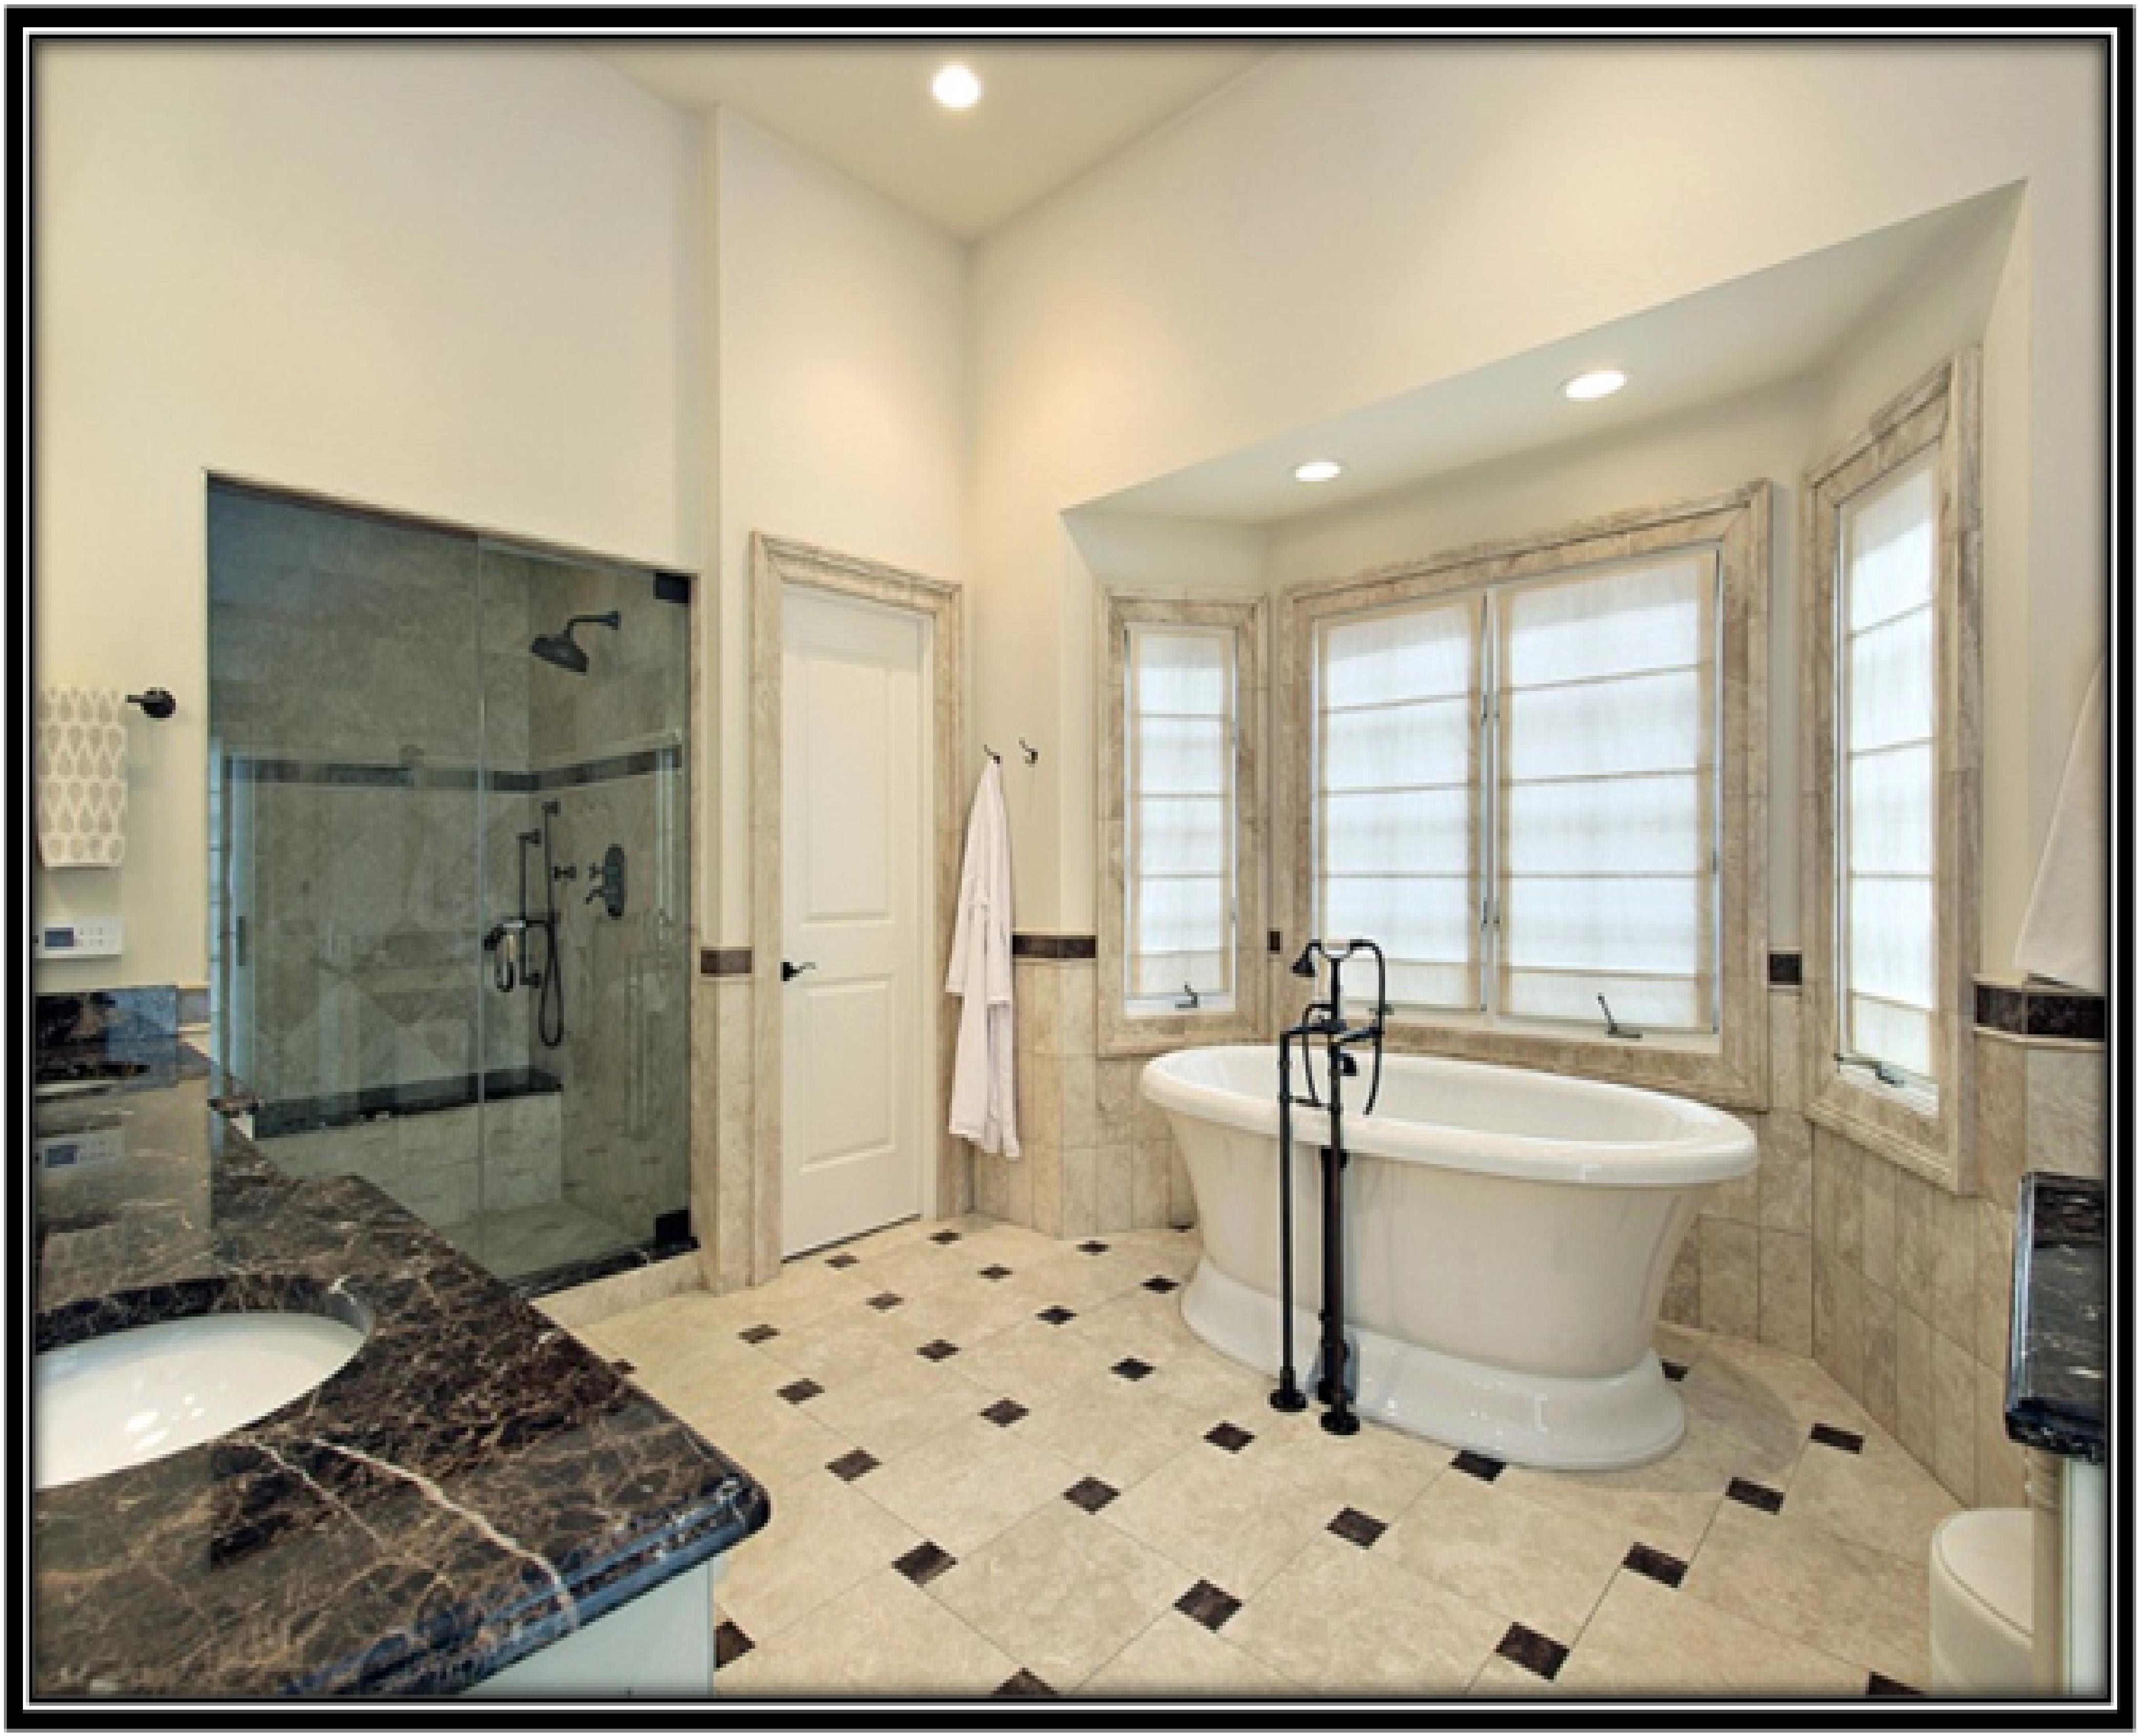 Luxury Bathroom Decoration Ideas - Home Decor Ideas